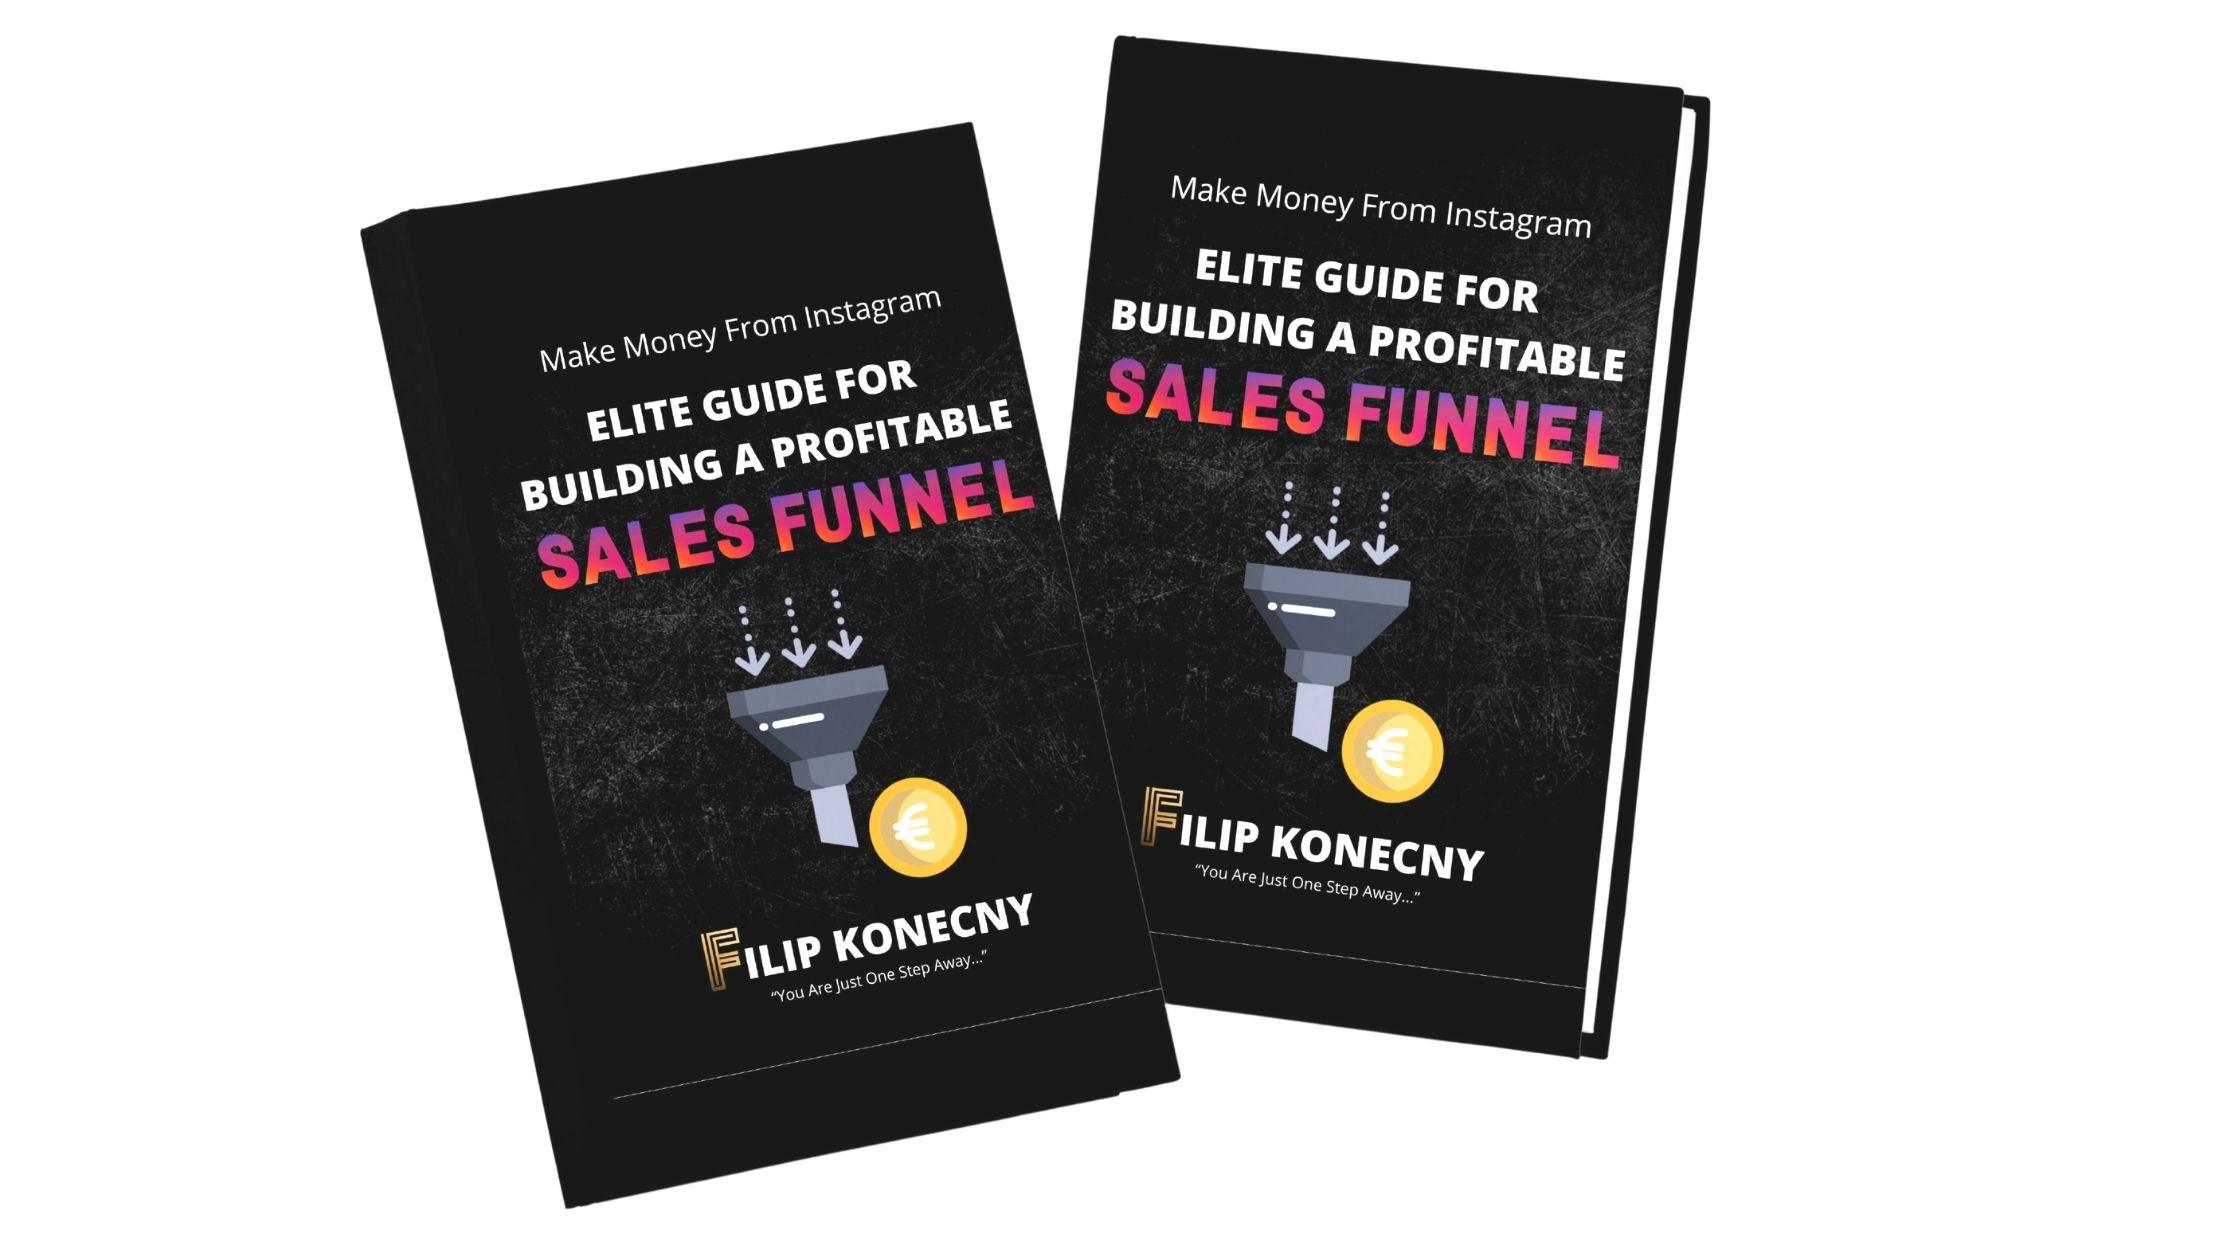 elite guide for building a profitable sales funnel